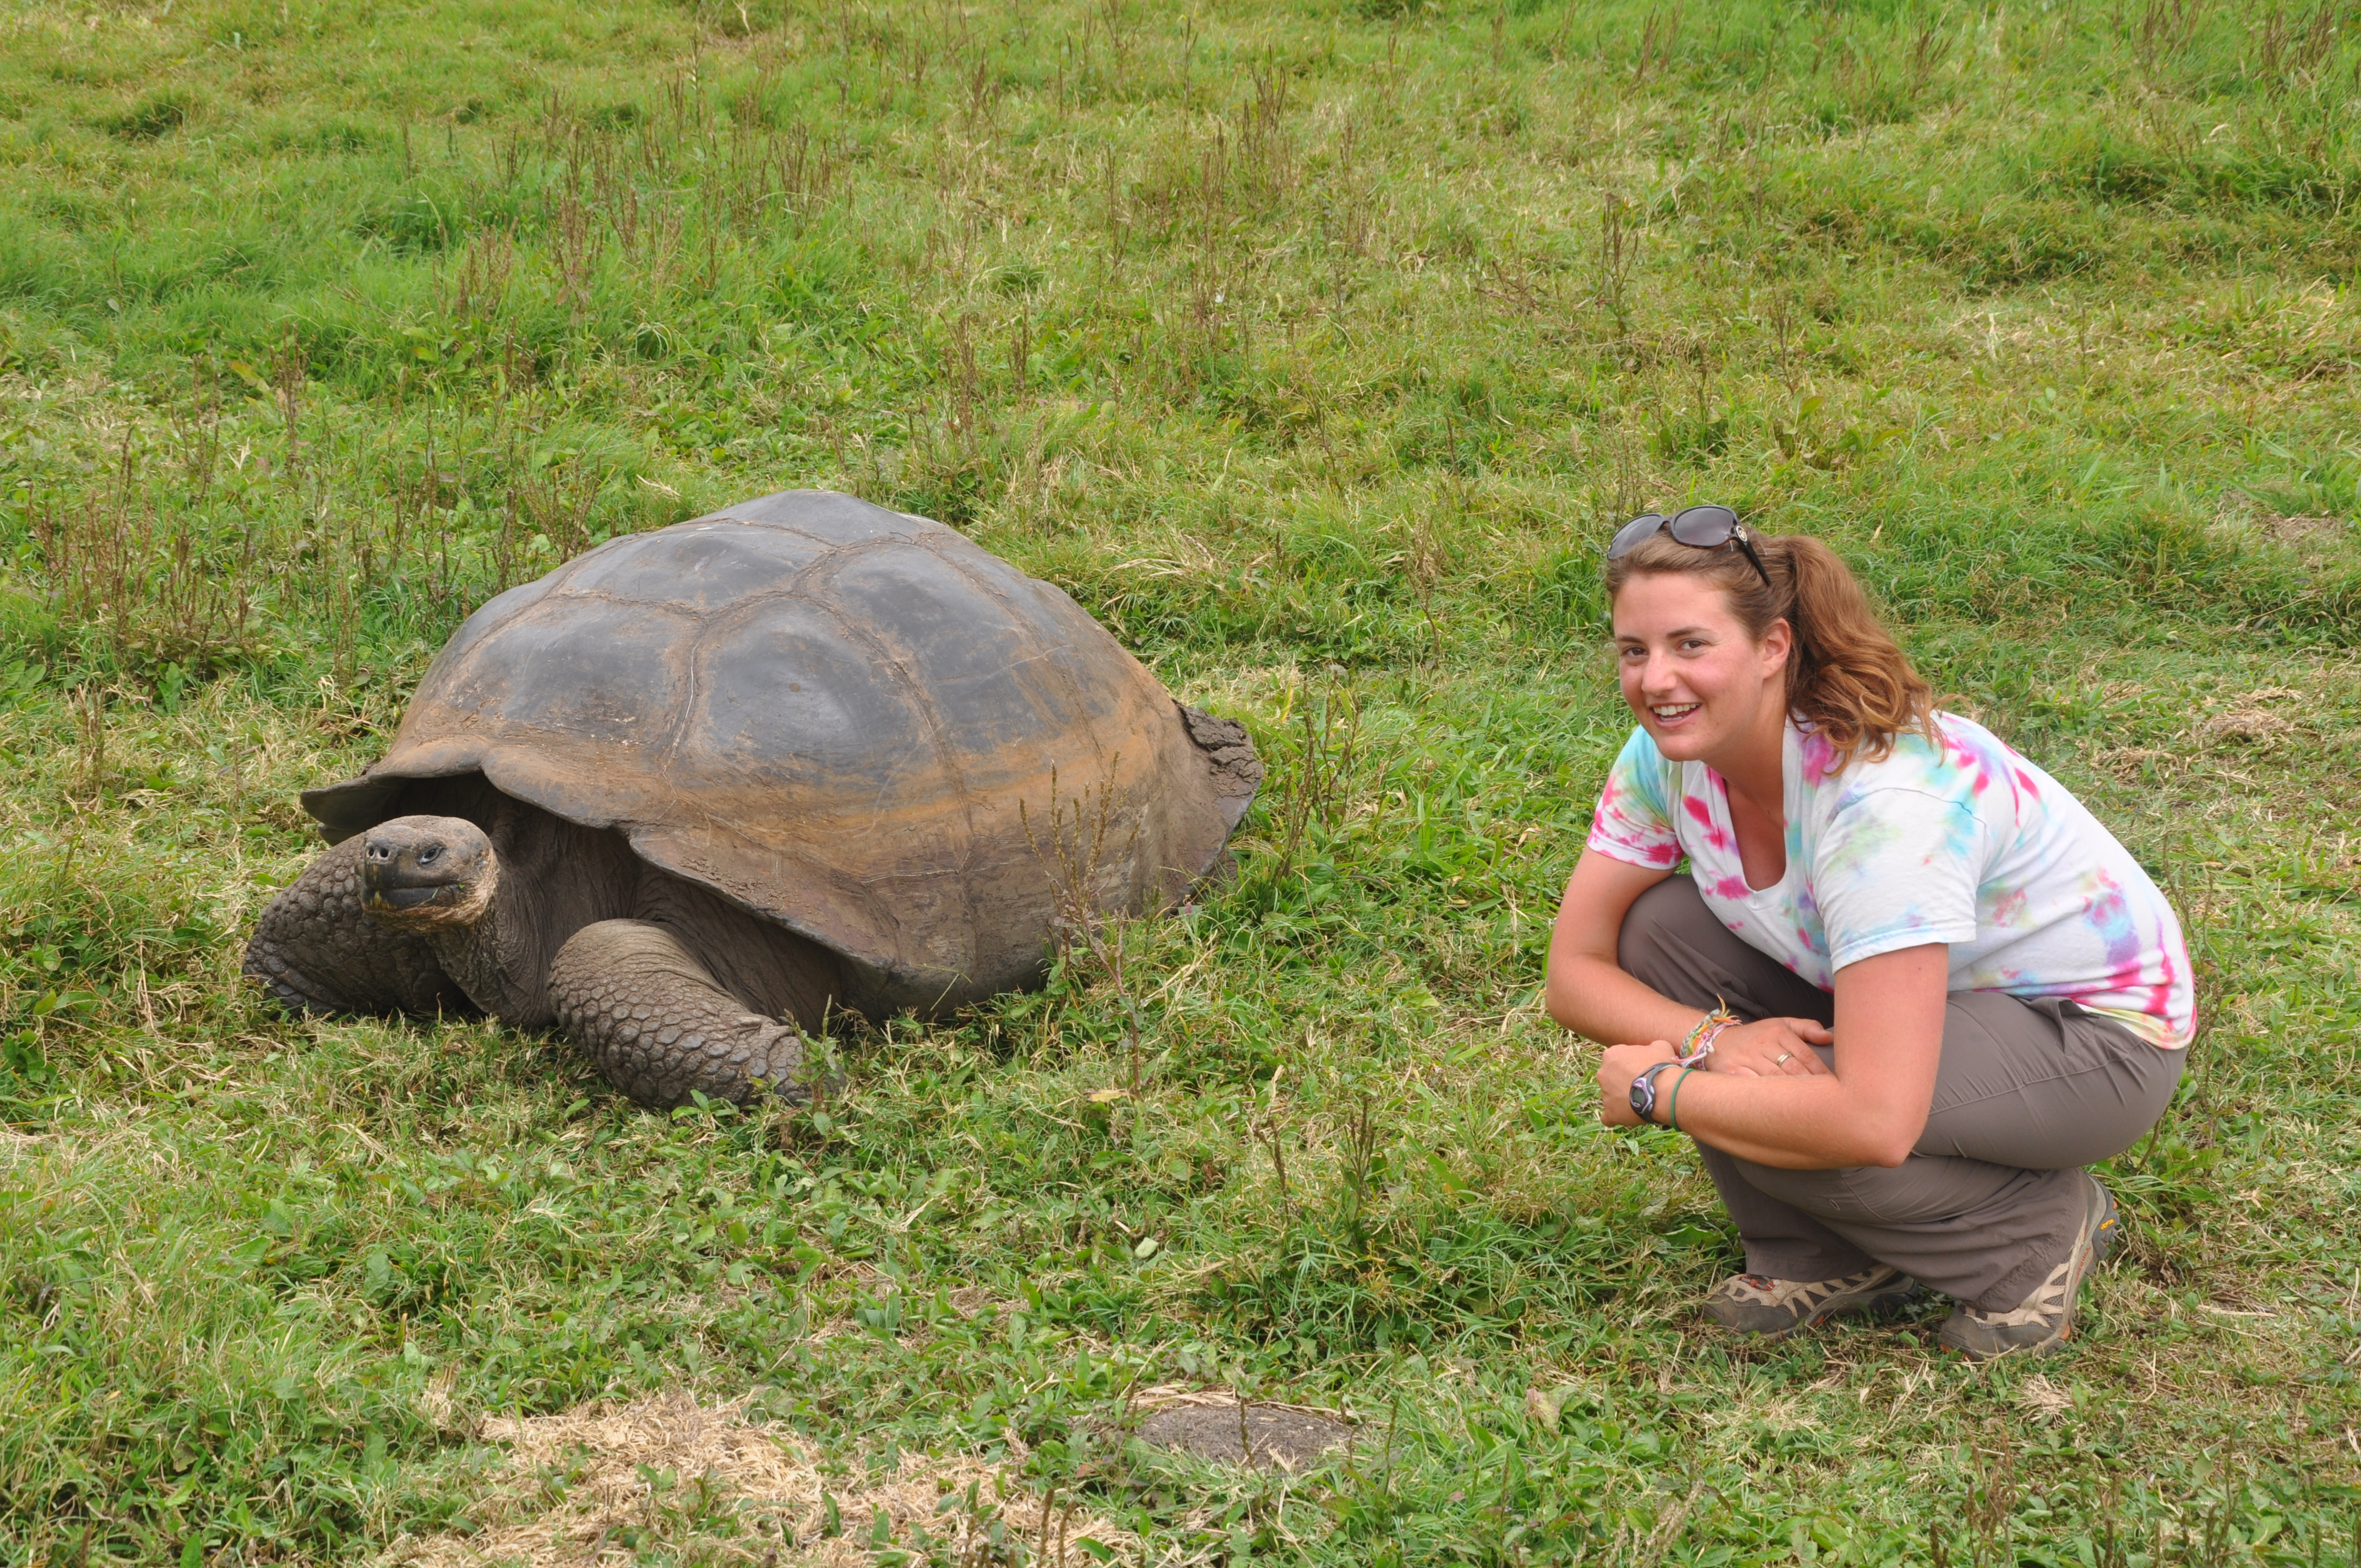 Gap Year Program - Pacific Discovery: South America Gap Year Semester  4